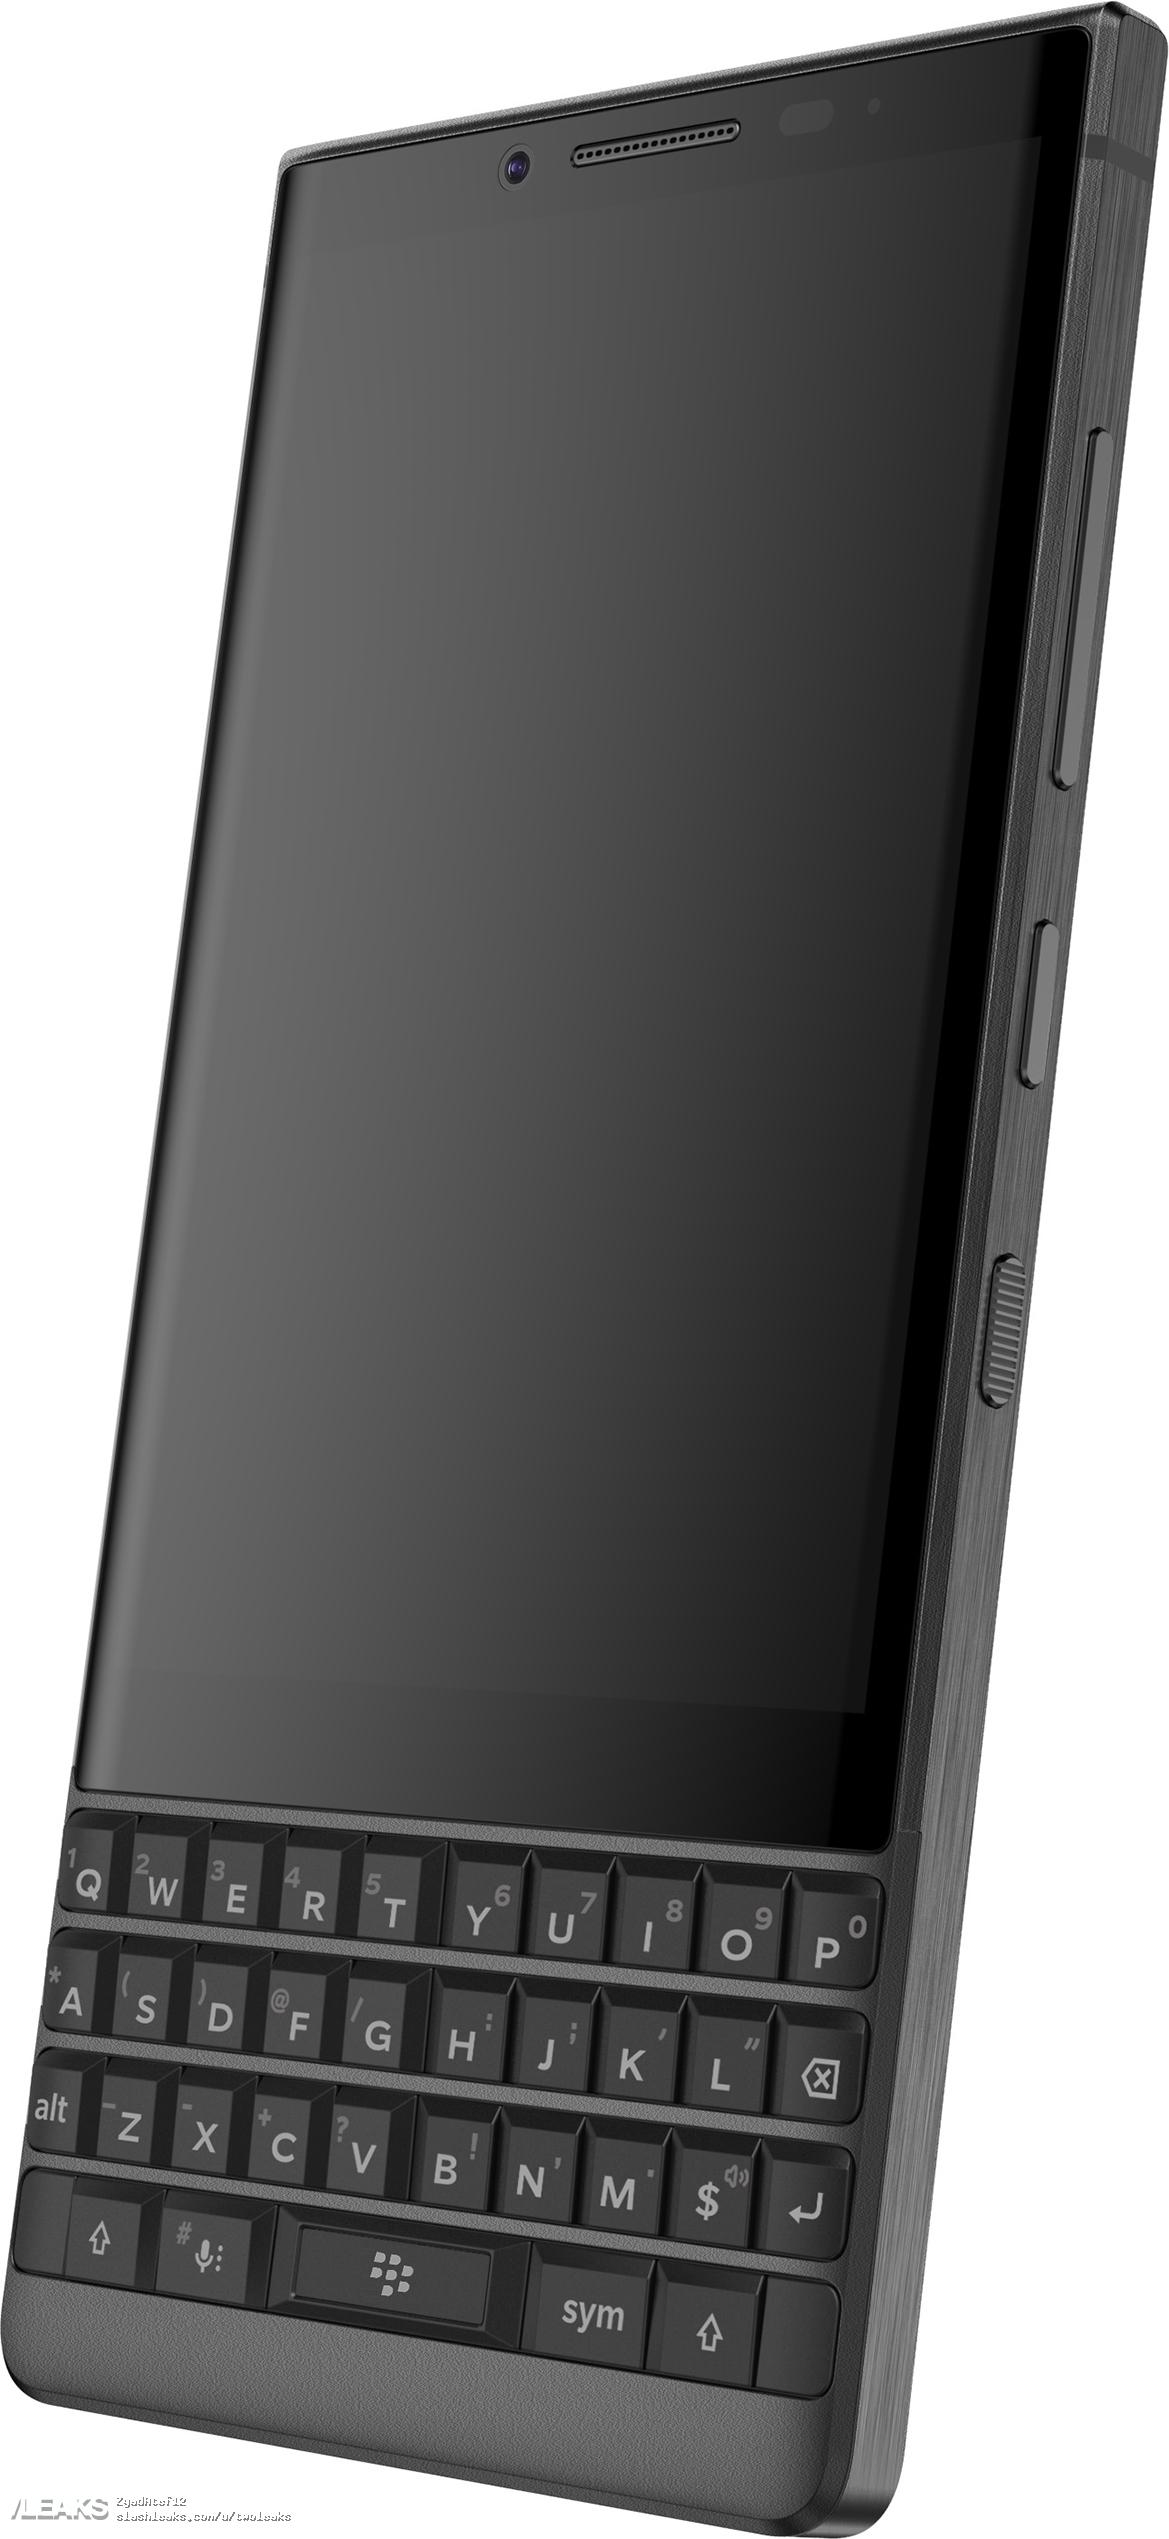 Новый смартфон BlackBerry на рендерах